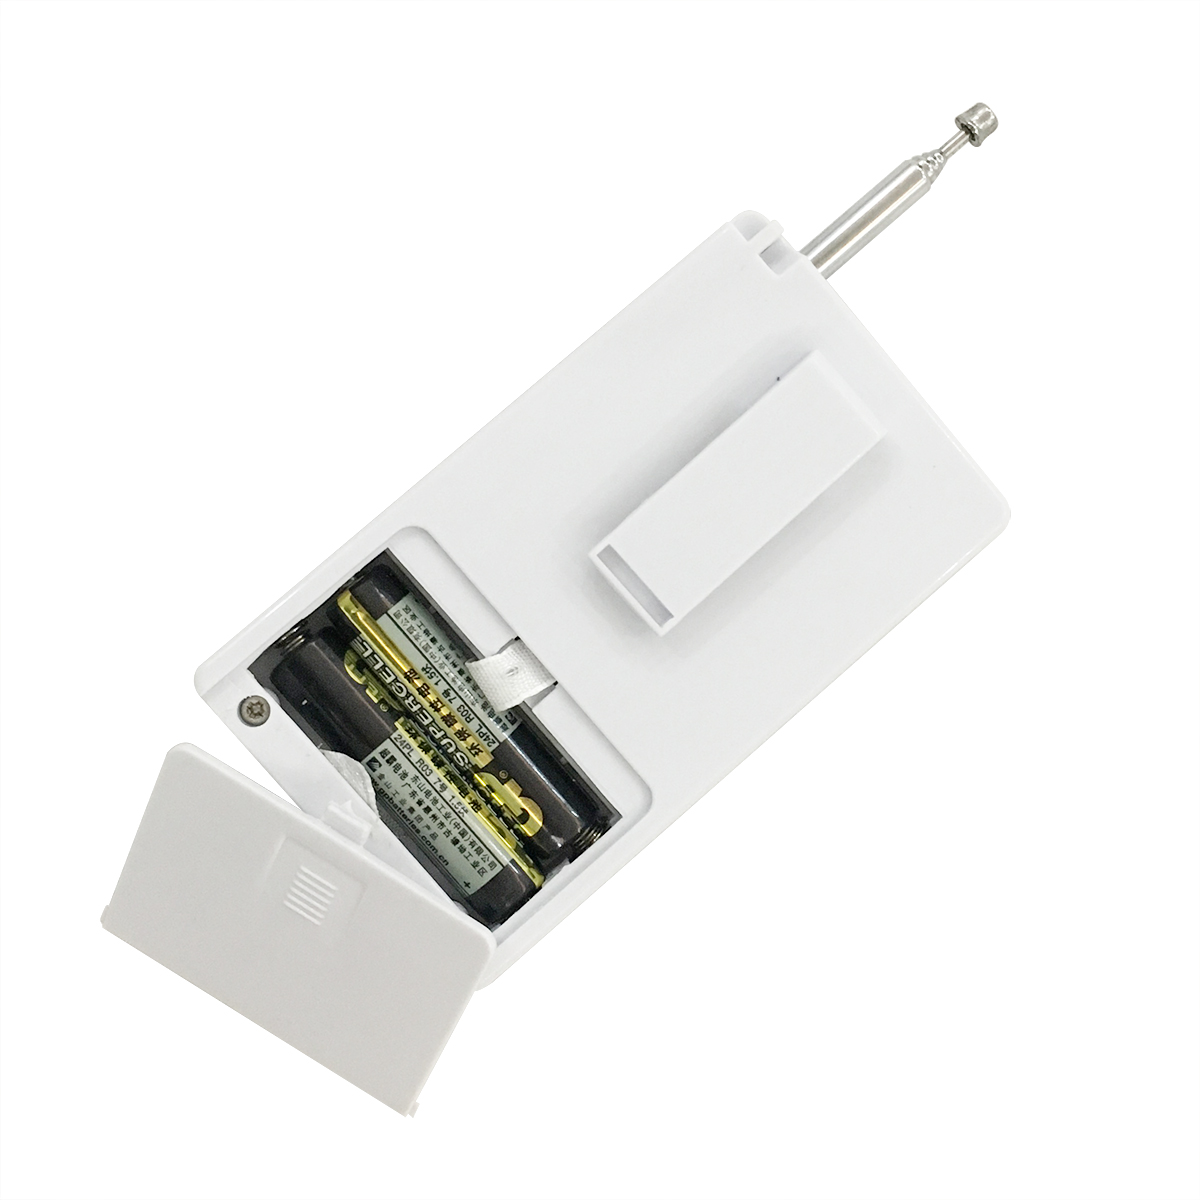 Mini դյուրակիր ստերեո թվային FM հաղորդիչ - Դյուրակիր աուդիո և վիդեո - Լուսանկար 3